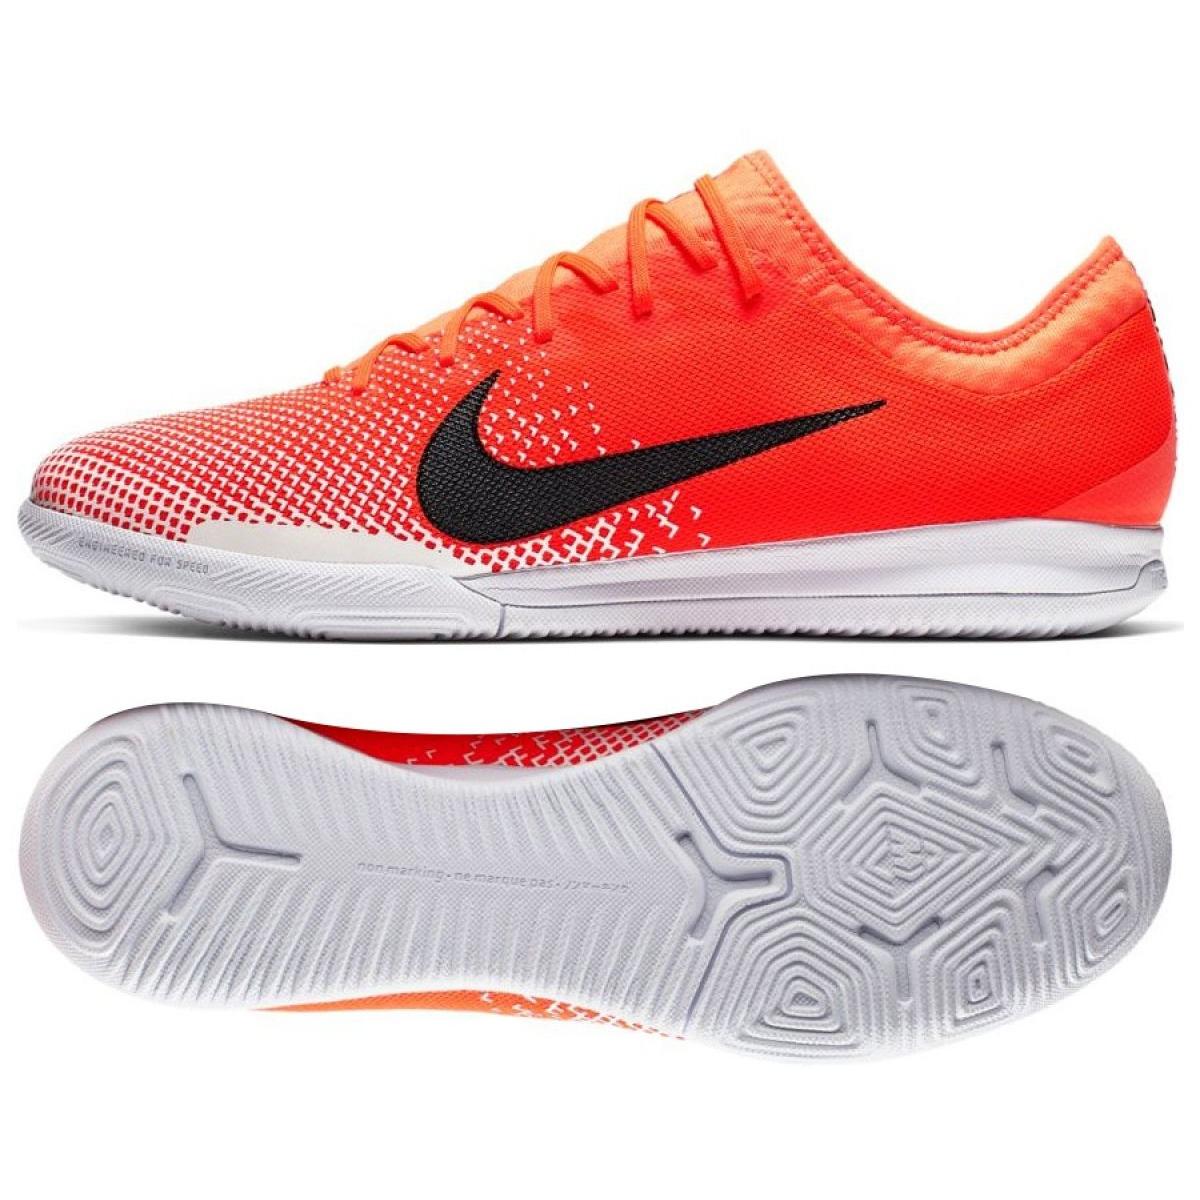 Zapatos Nike Mercurial Vapor 12 Pro